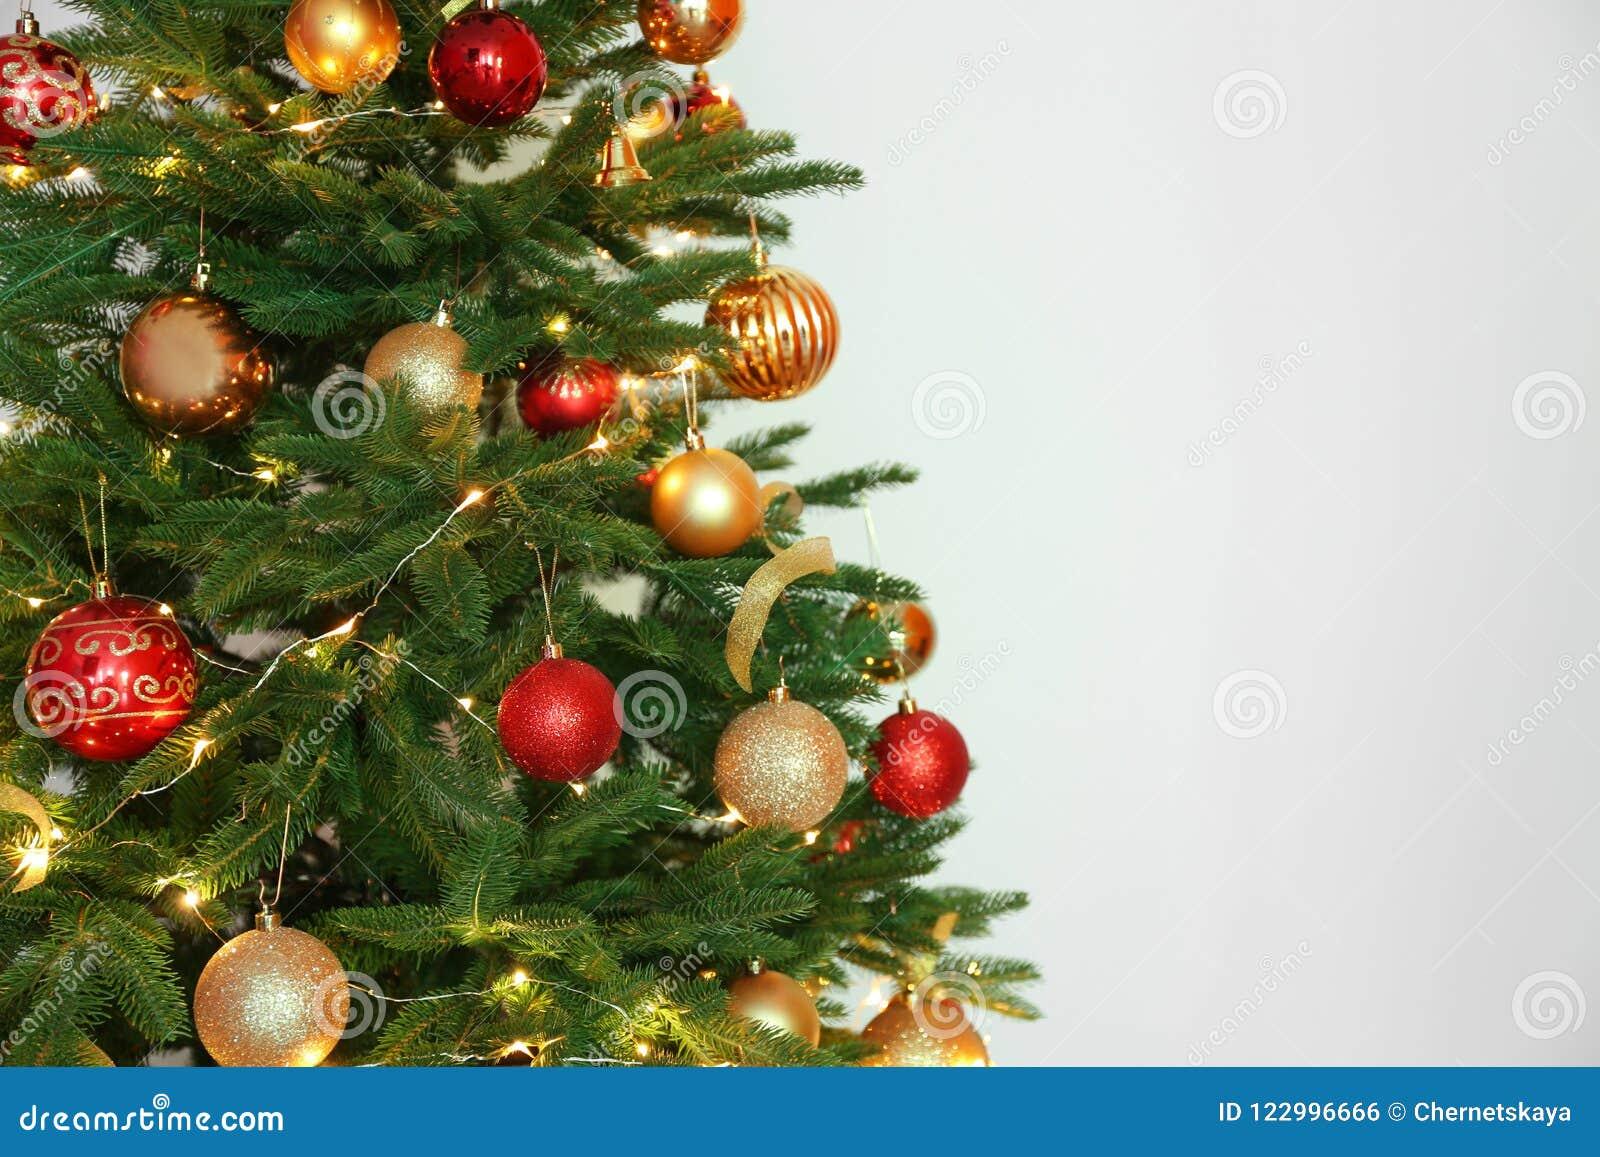 download beautiful christmas tree with fairy lights stock photo image of beautiful christmas